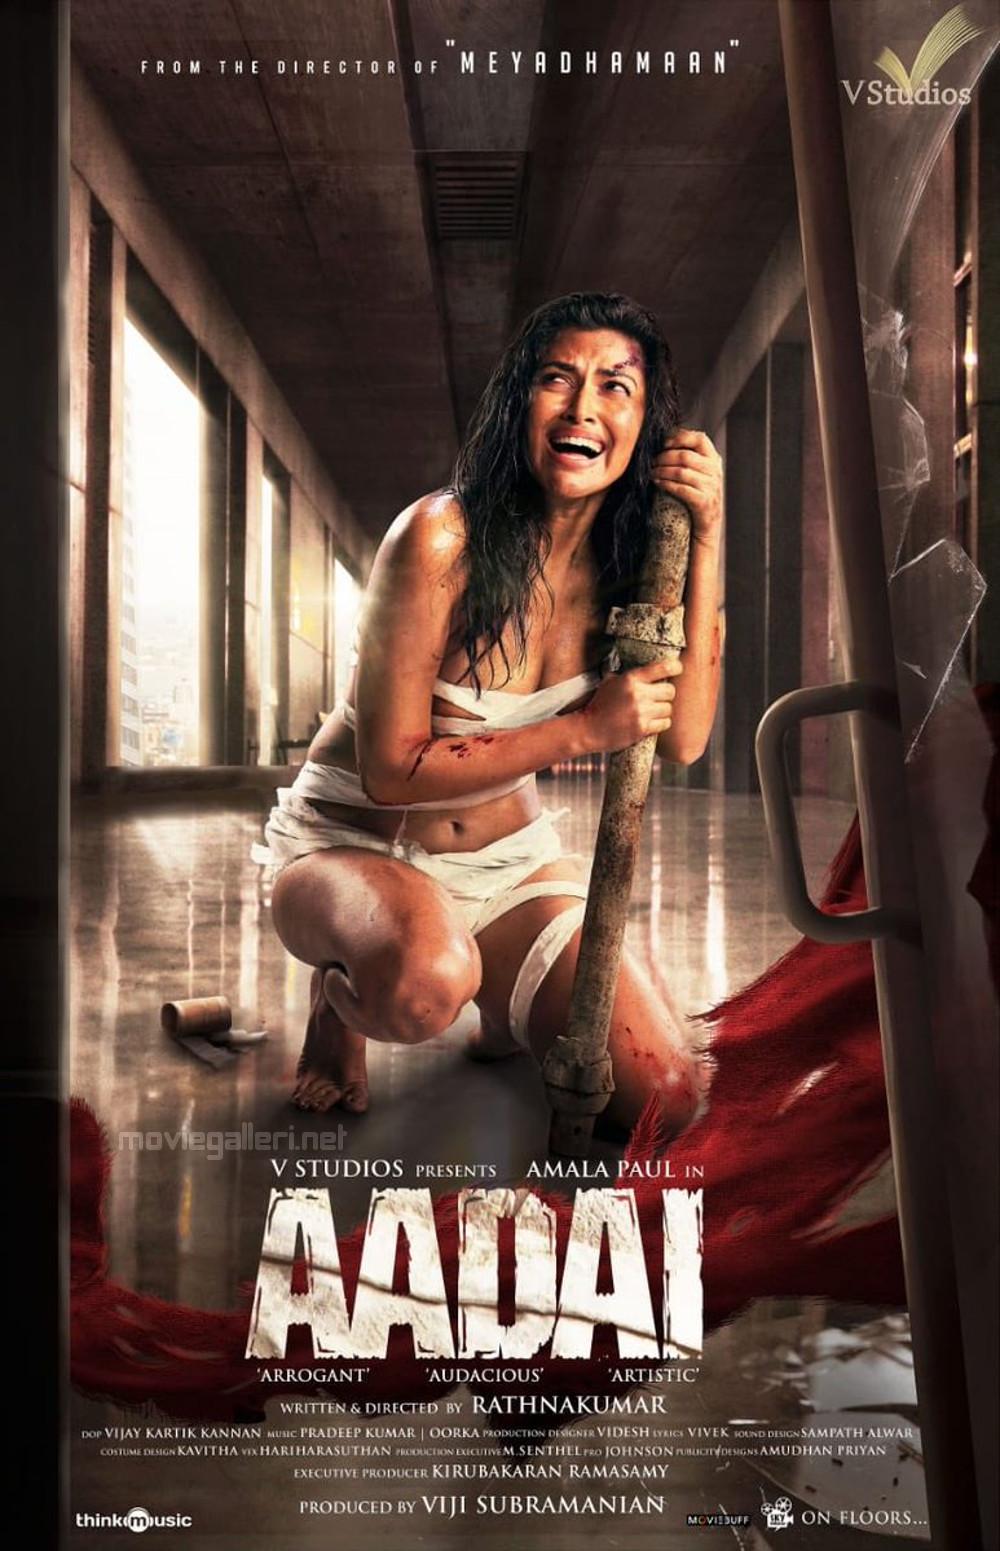 Actress Amala Paul Aadai First Look Poster HD